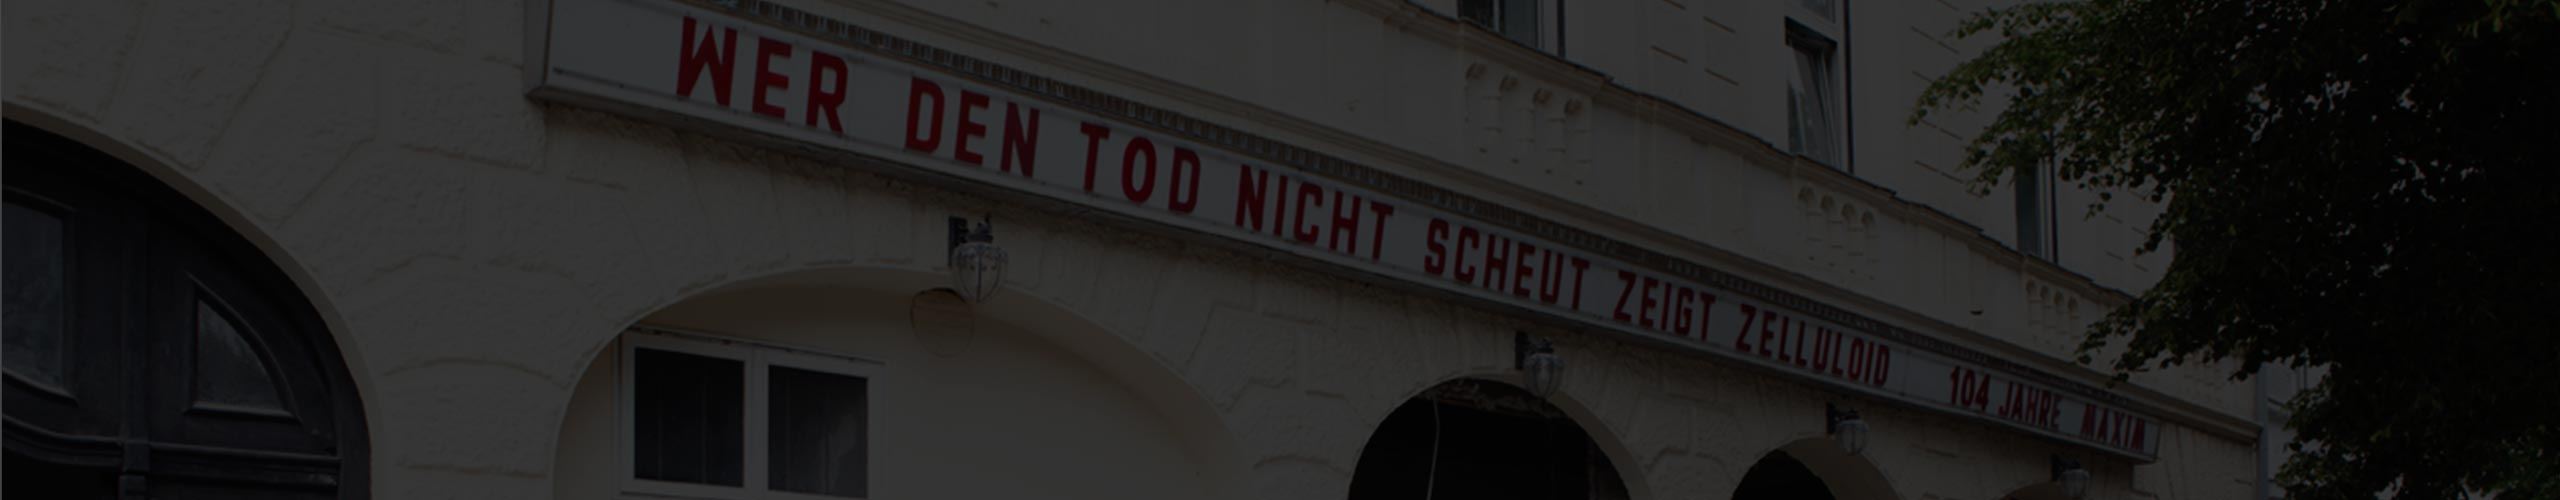 Maxim Kino Programm